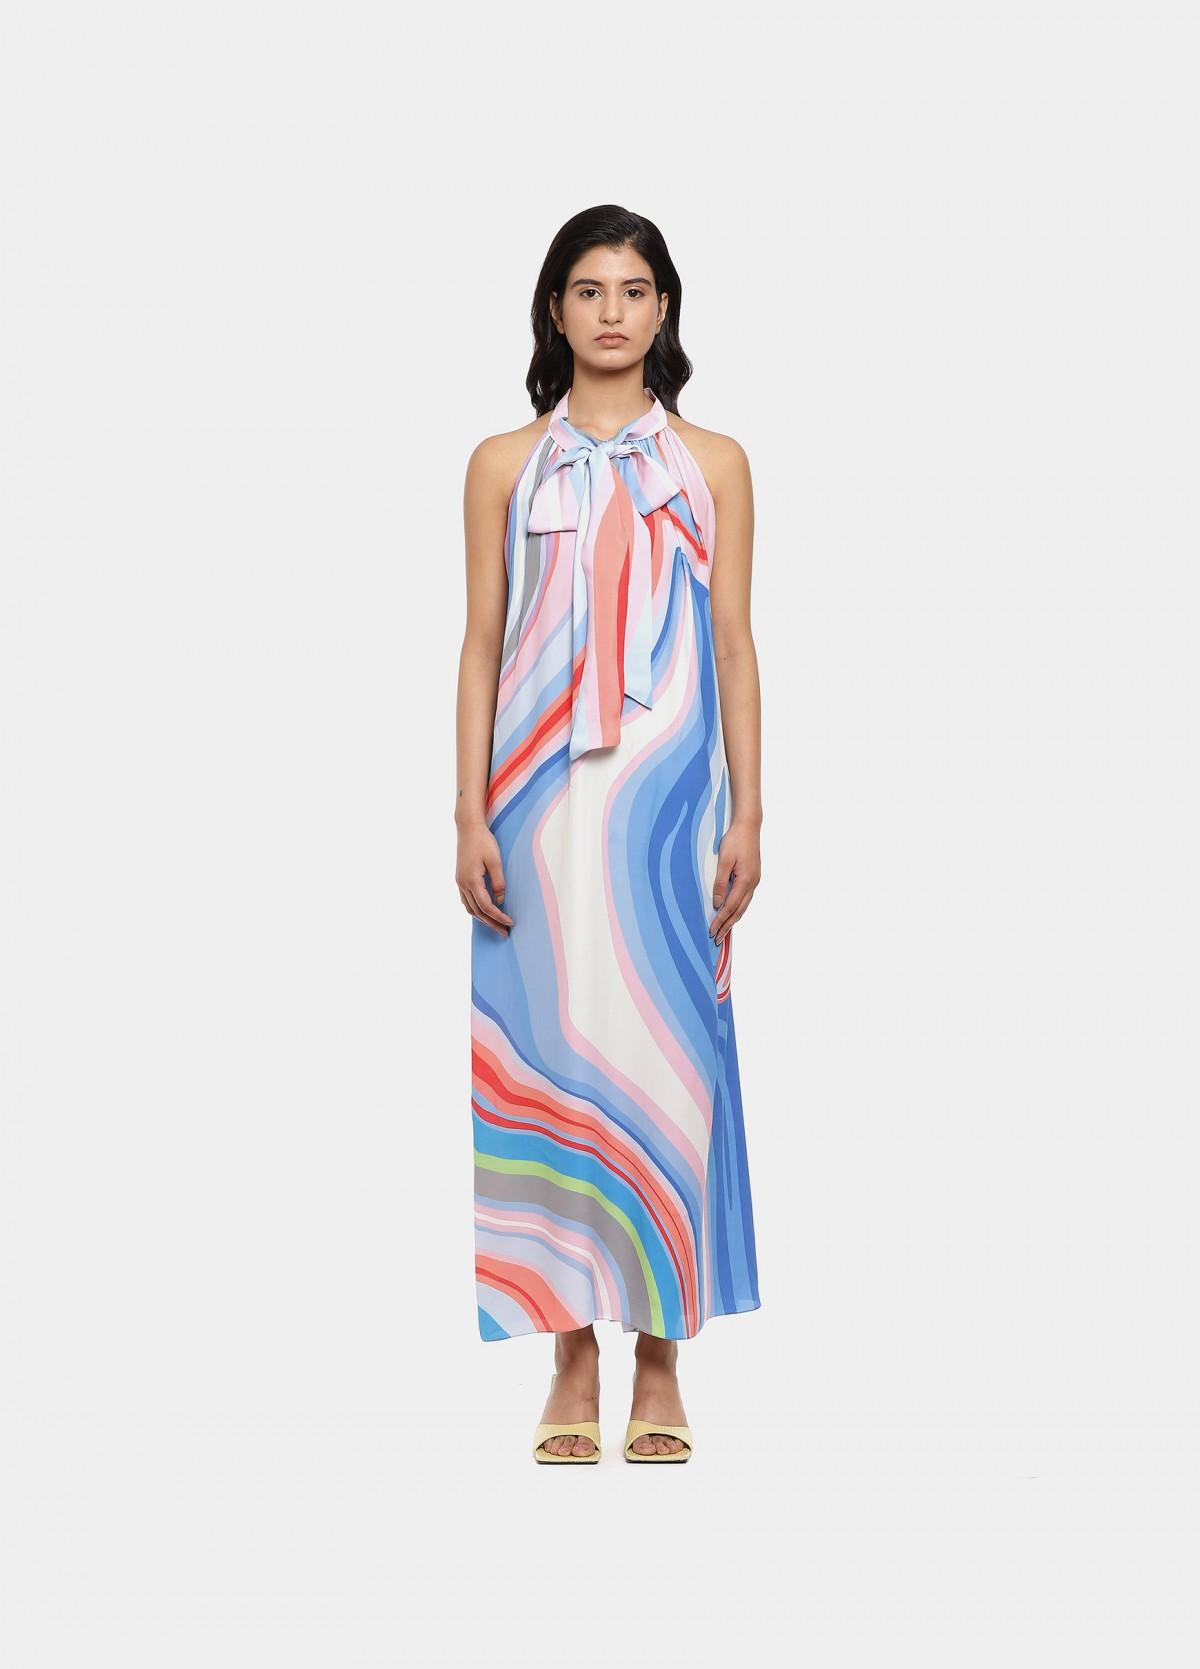 The Wonton Dress